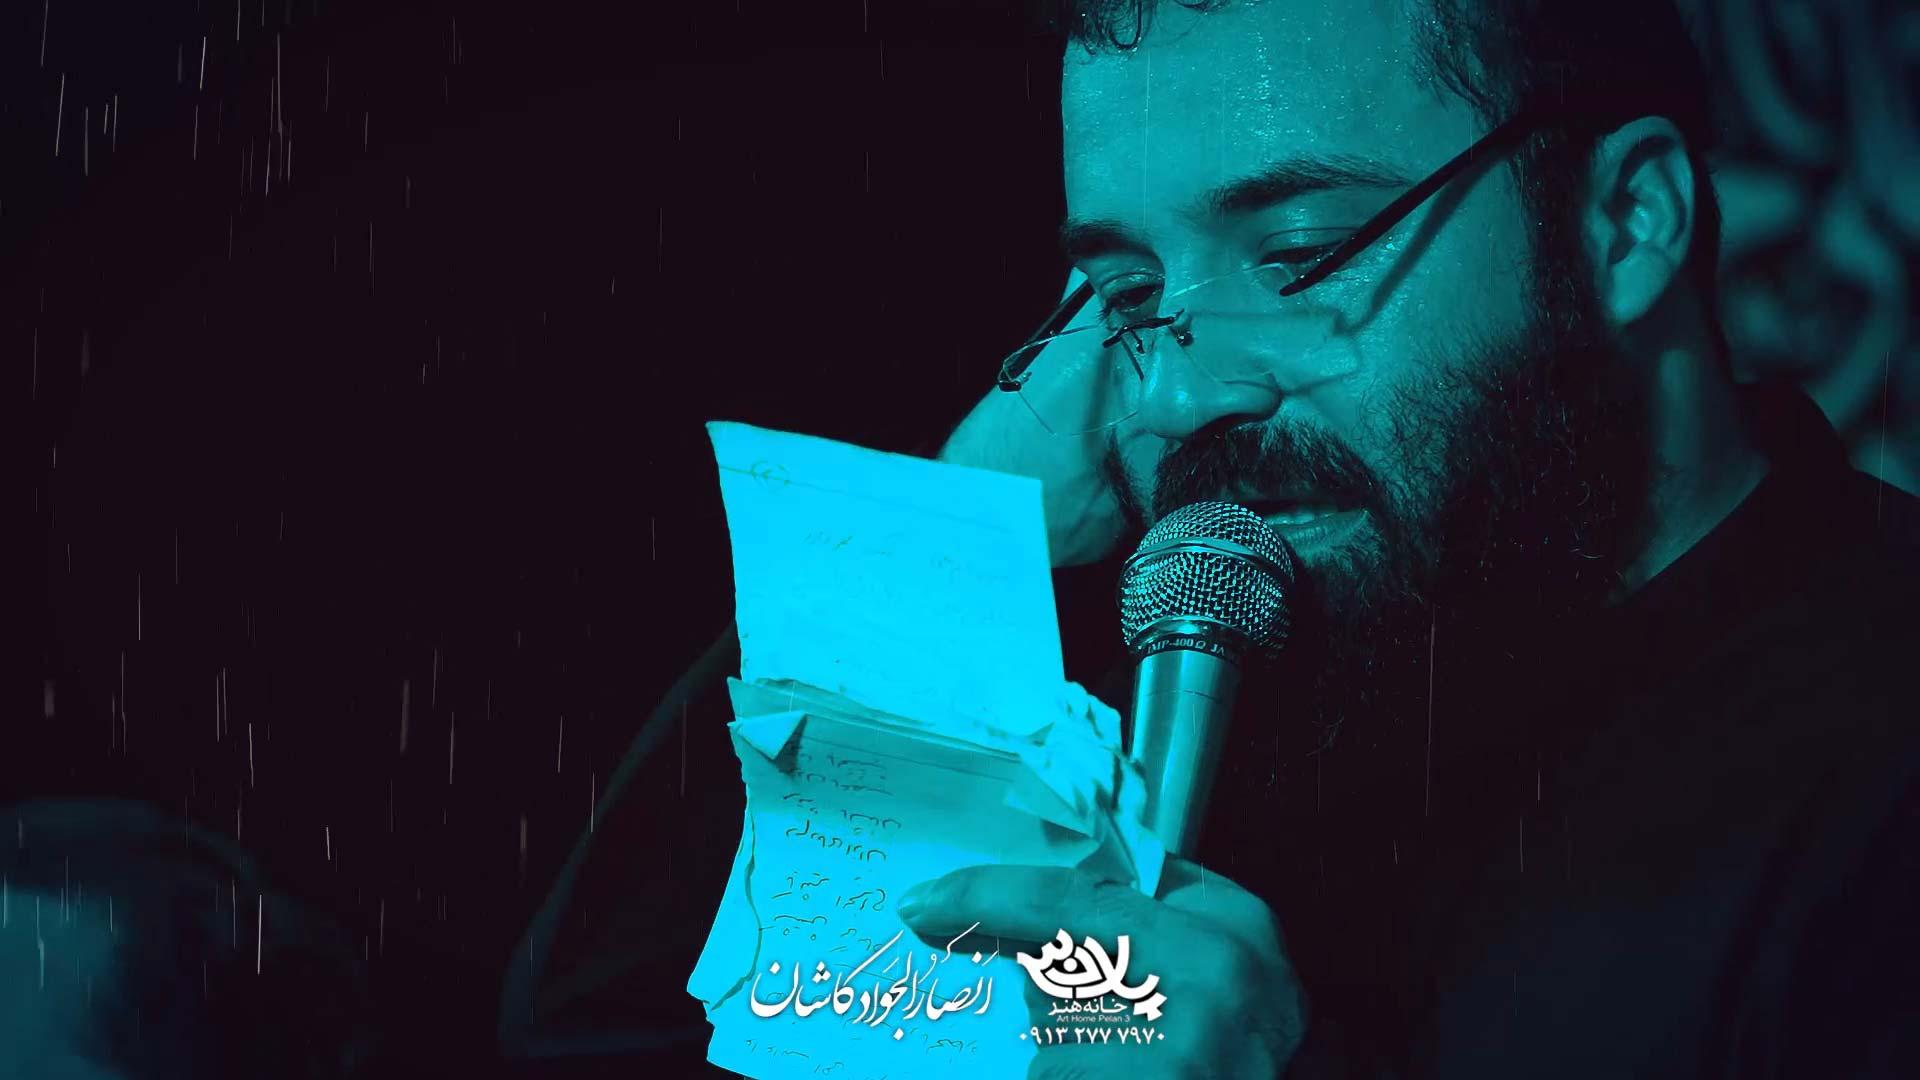 بدون اذن علی عبدالرضا هلالی